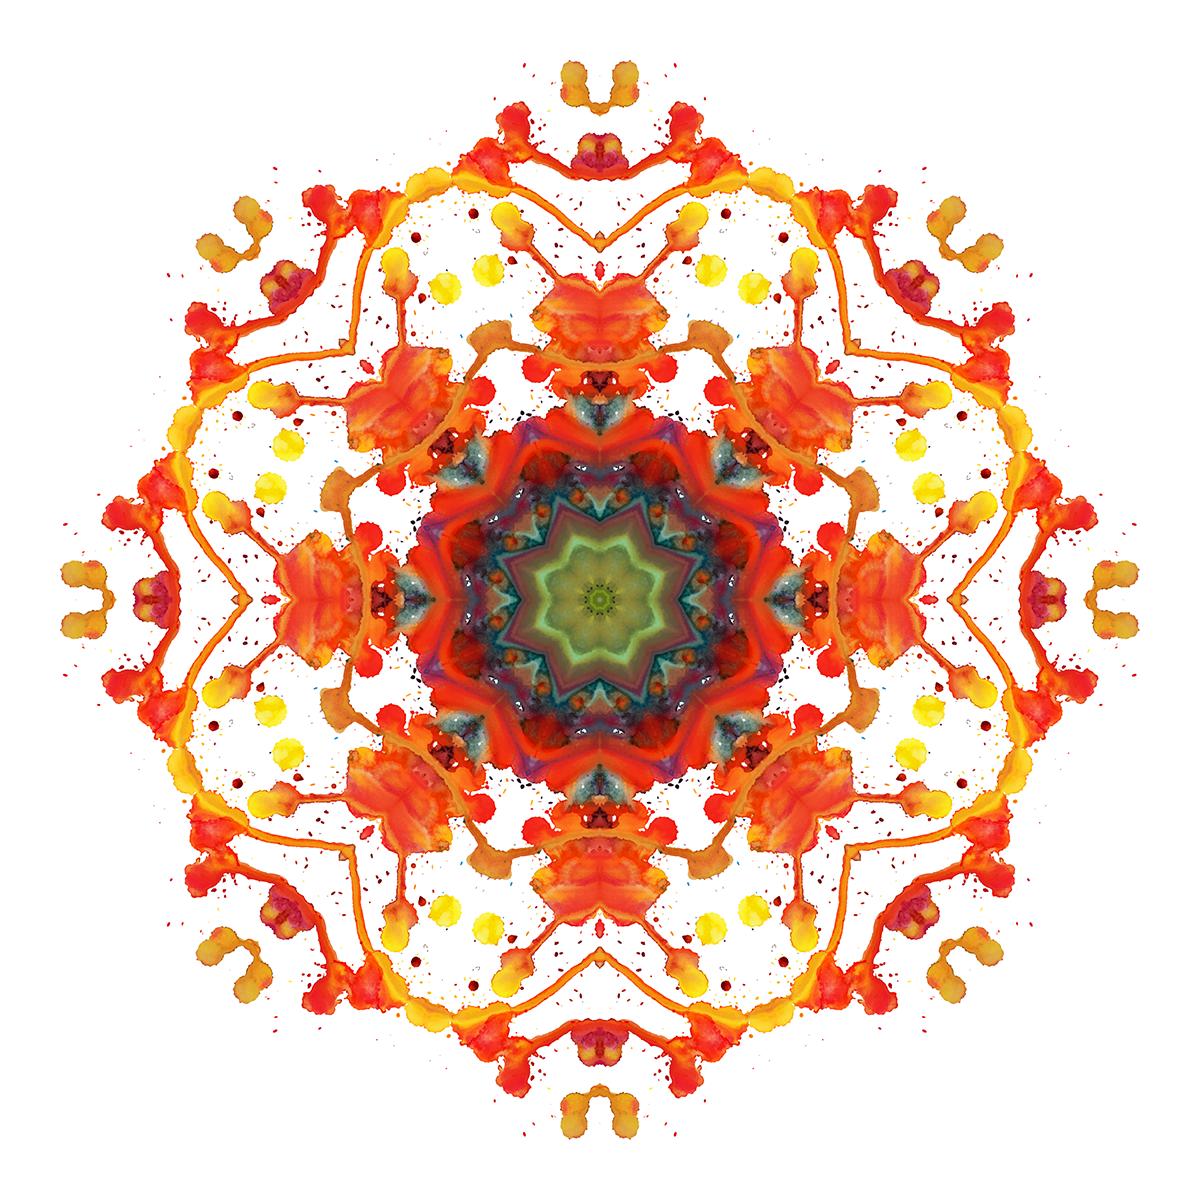 watercolor Caleidoscope color